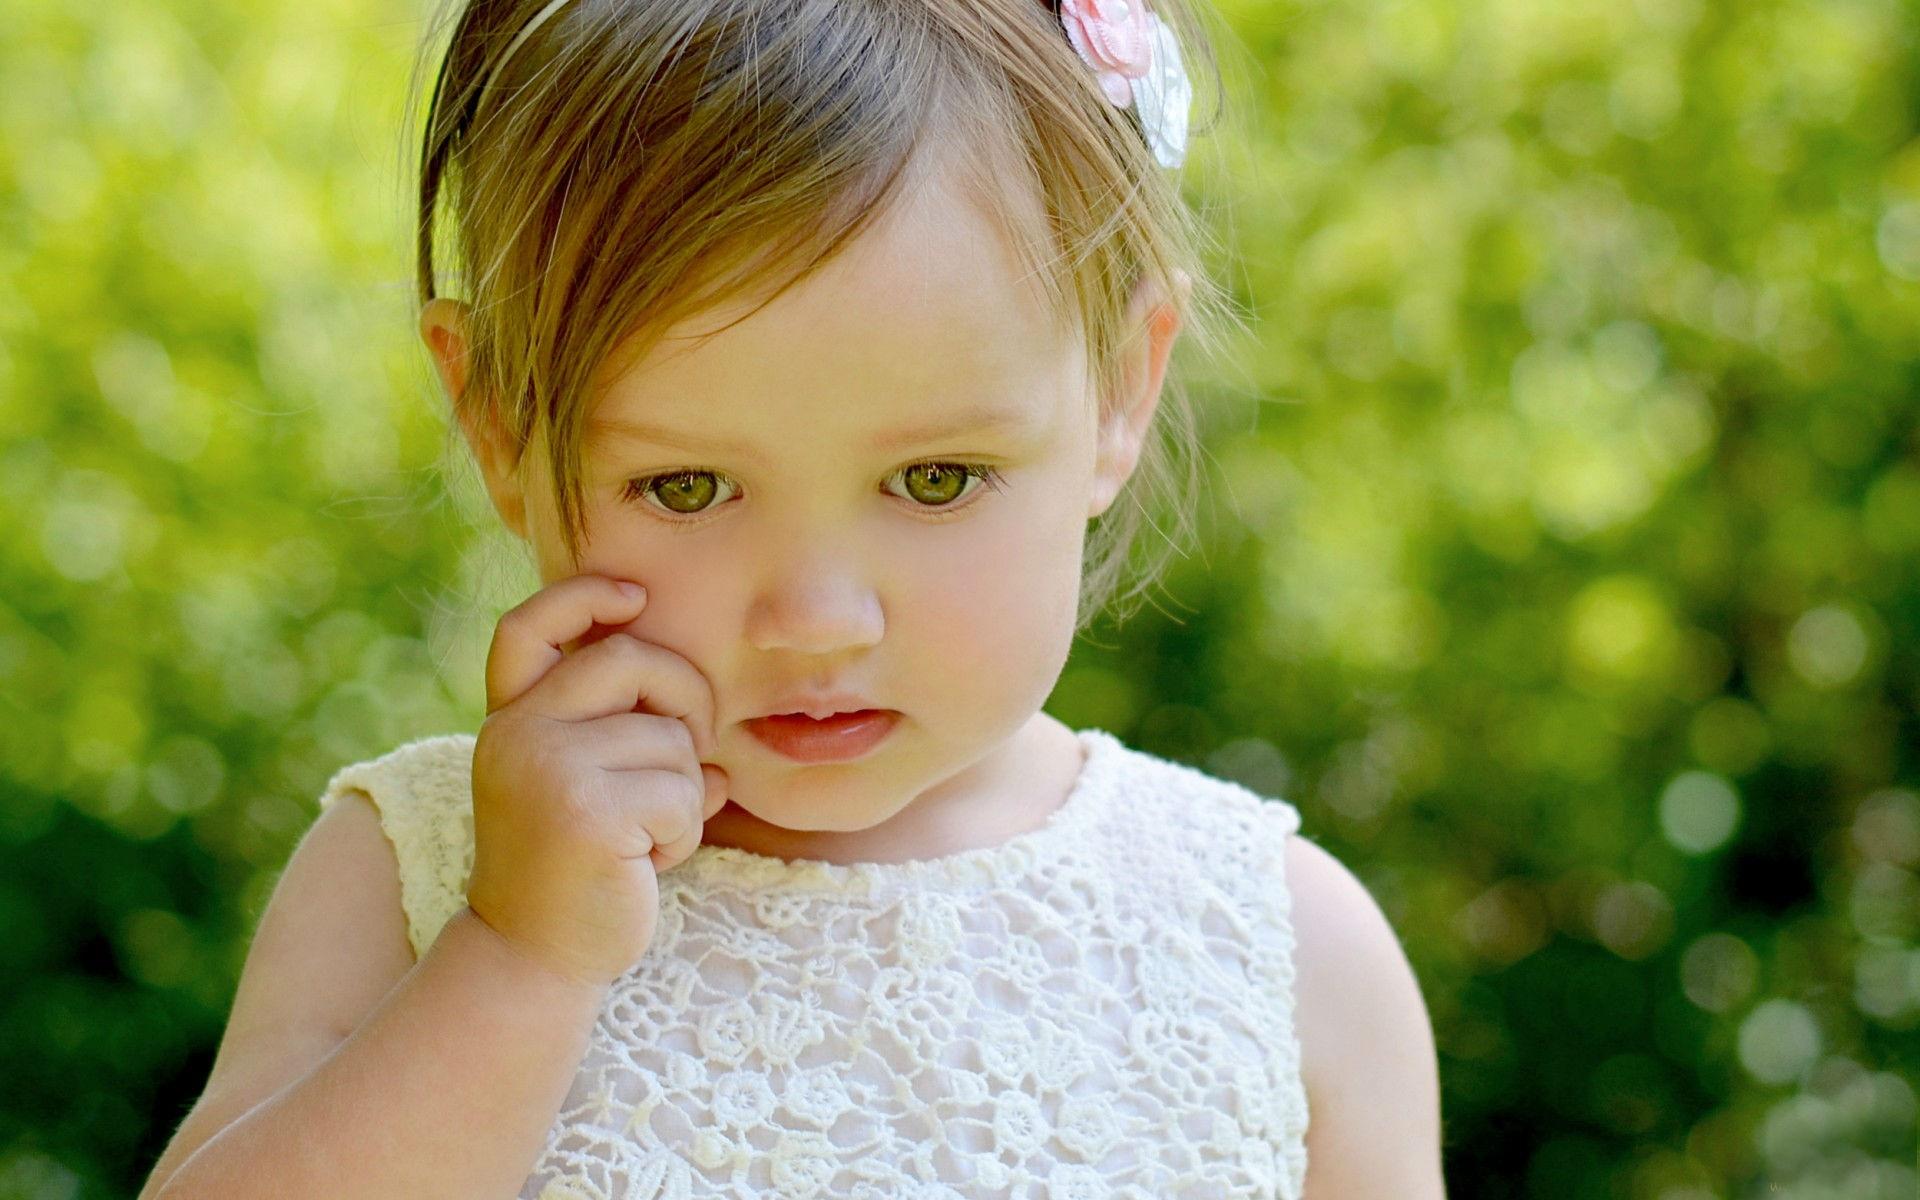 Cute Boy Crying Wallpaper صور اطفال بنات صغيرة مواليد في خلفيات بنات بجودة Hd سوبر